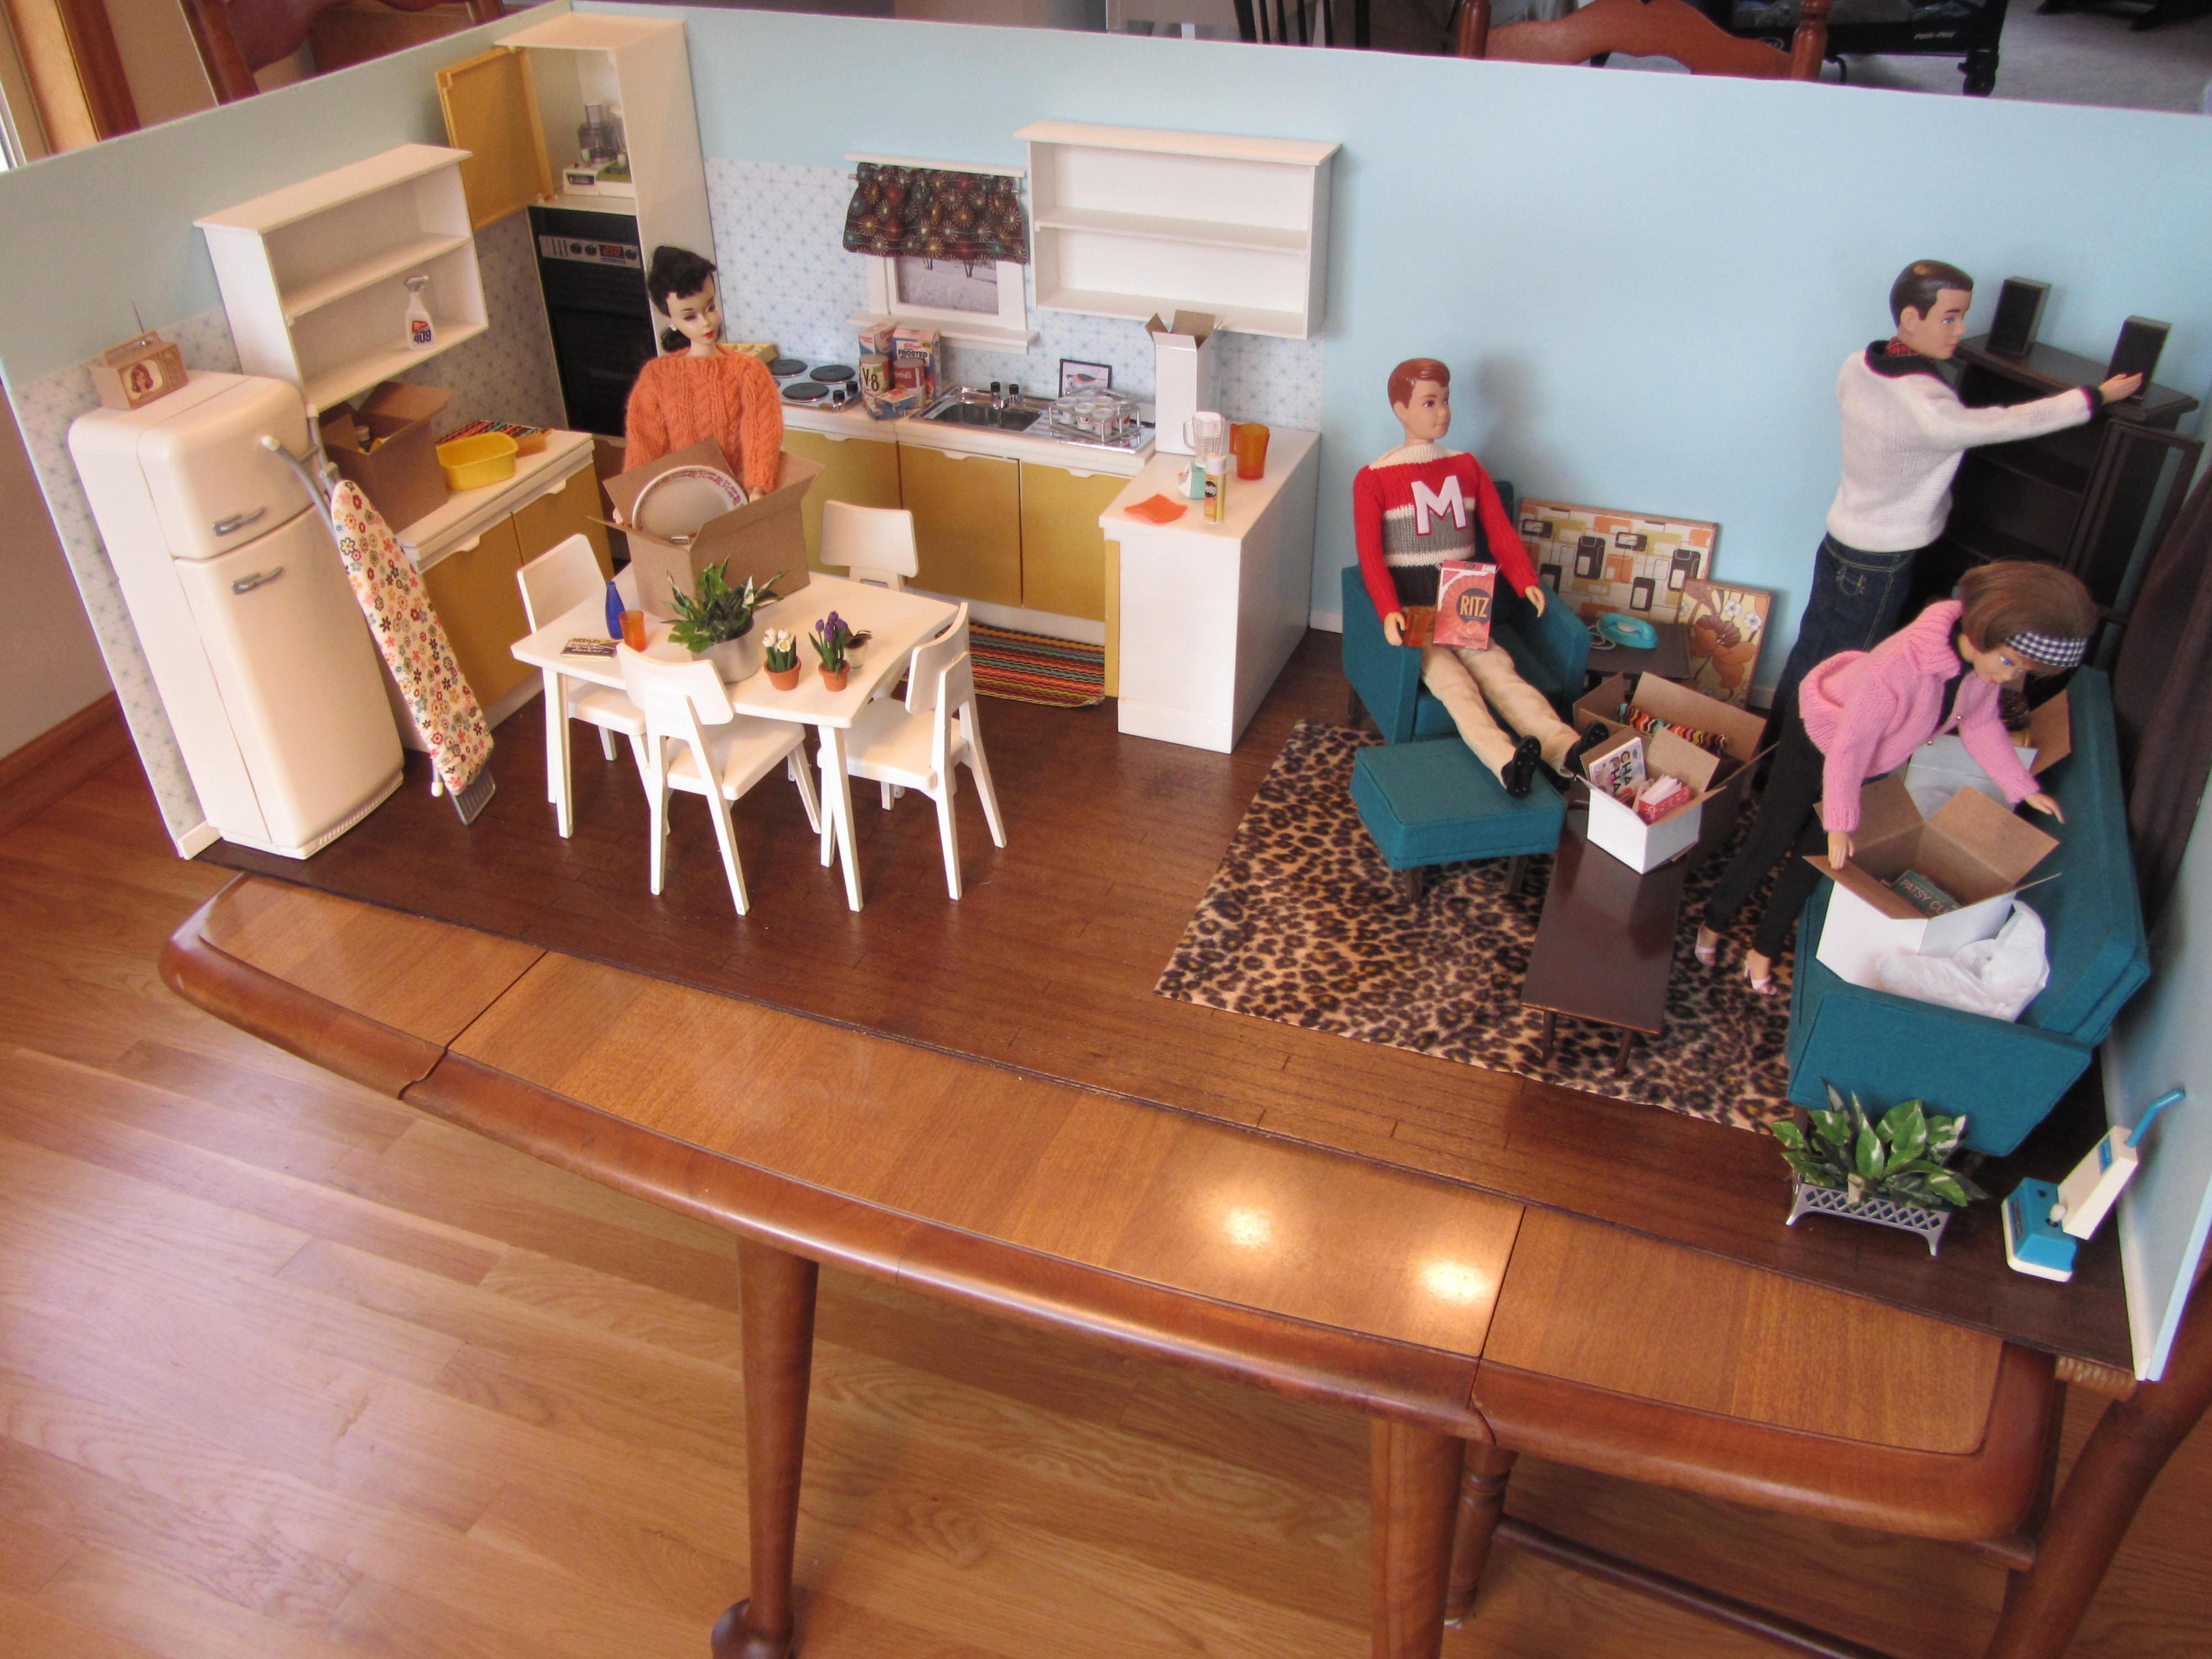 Hintergrundbilder : Zimmer, Tabelle, Lesen, Sessel, modern, Küche ...